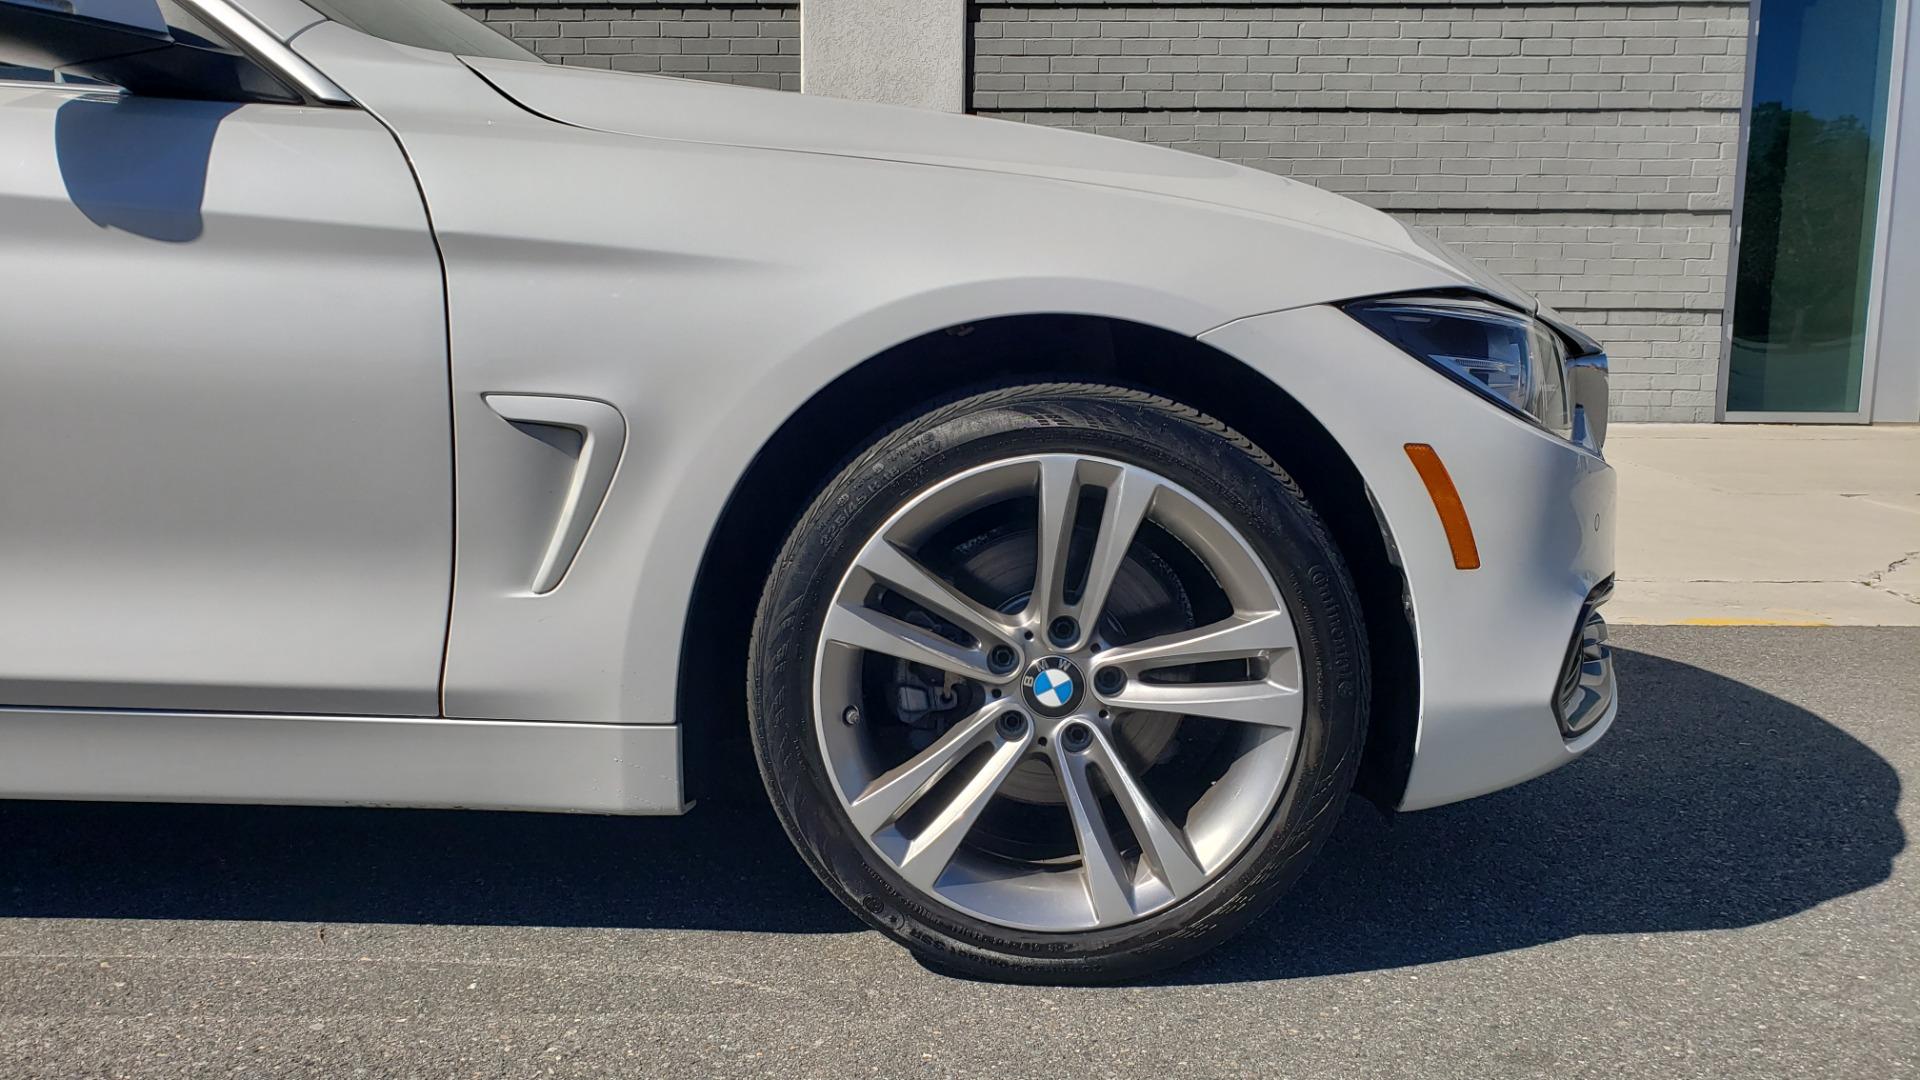 Used 2018 BMW 4 SERIES 430IXDRIVE / PREMIUM / NAV / SUNROOF / ESSENTIALS PKG for sale $27,795 at Formula Imports in Charlotte NC 28227 85